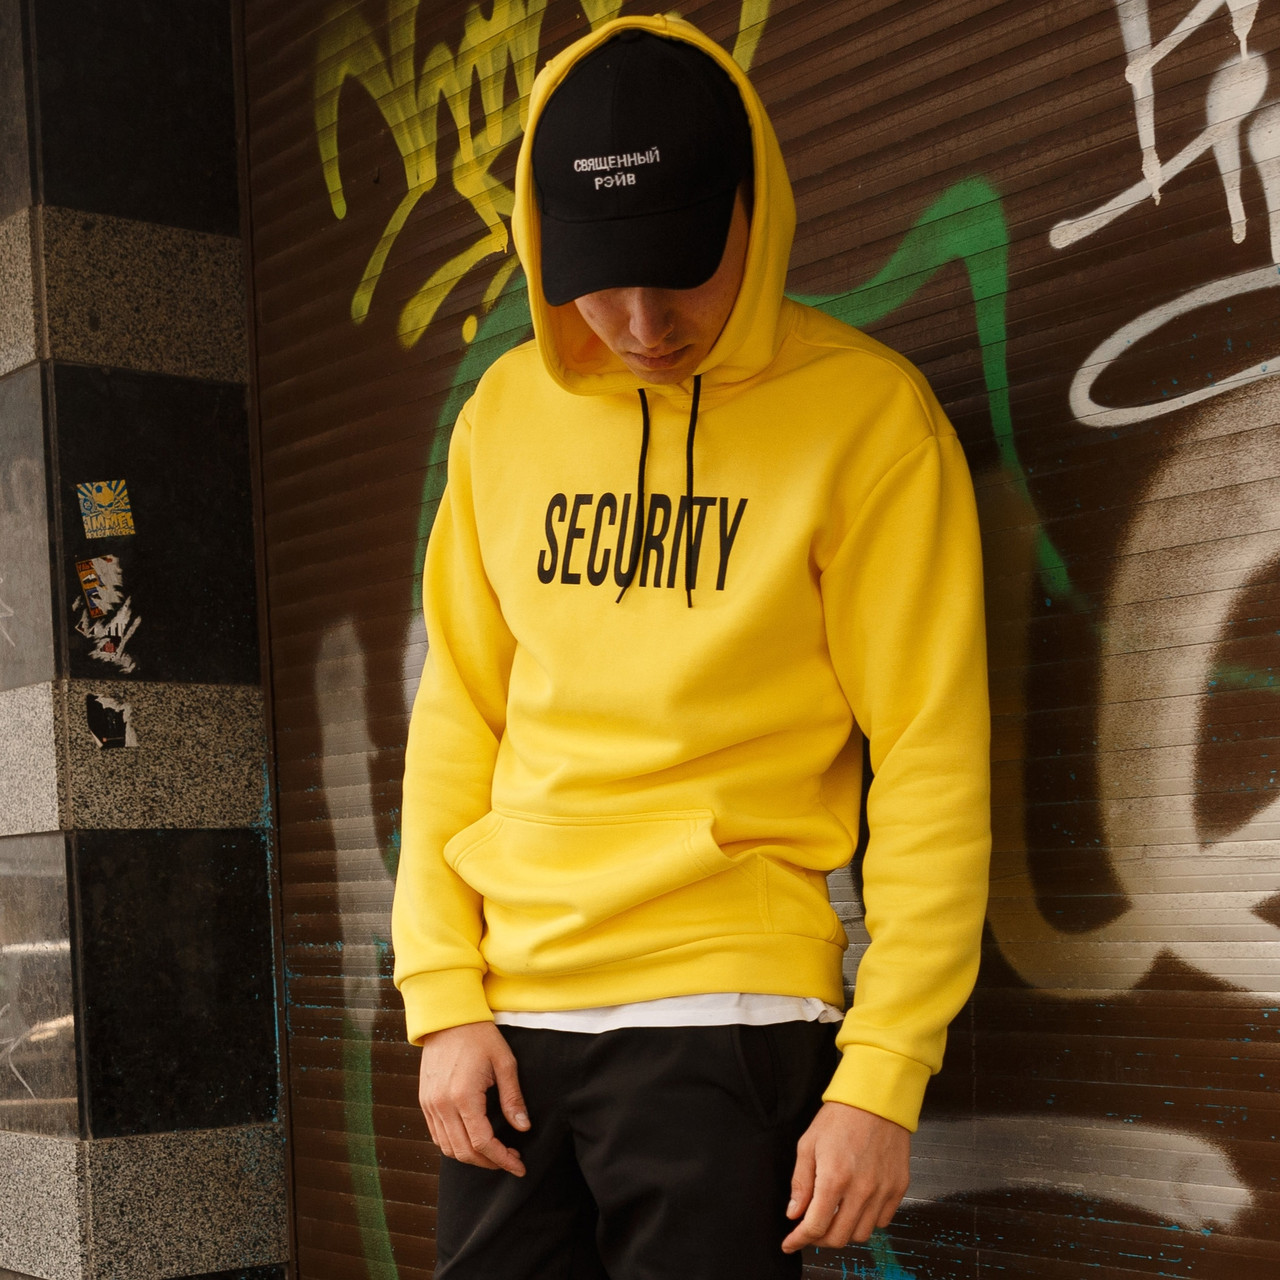 Мужская кофта - Худи SECURITY, желтая